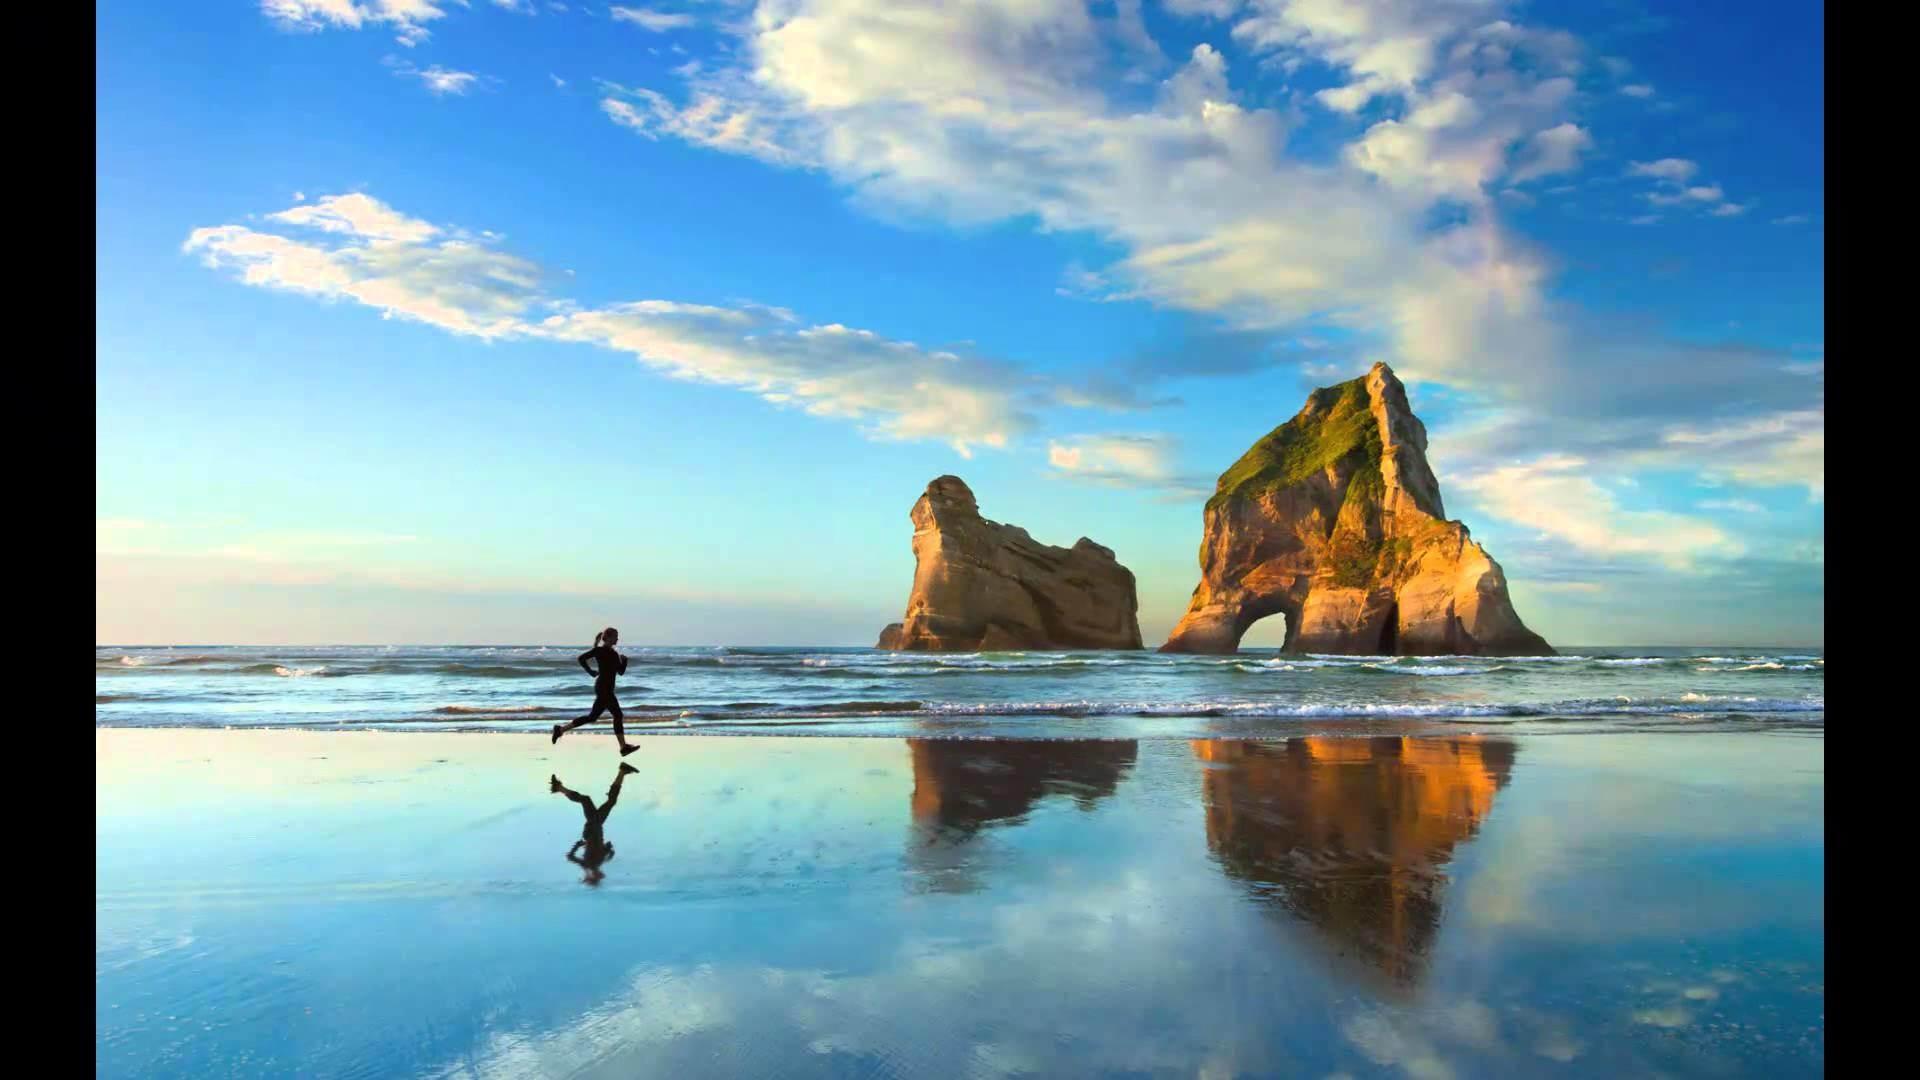 windows 10 lock screen wallpaper download,body of water,natural landscape,nature,sky,ocean